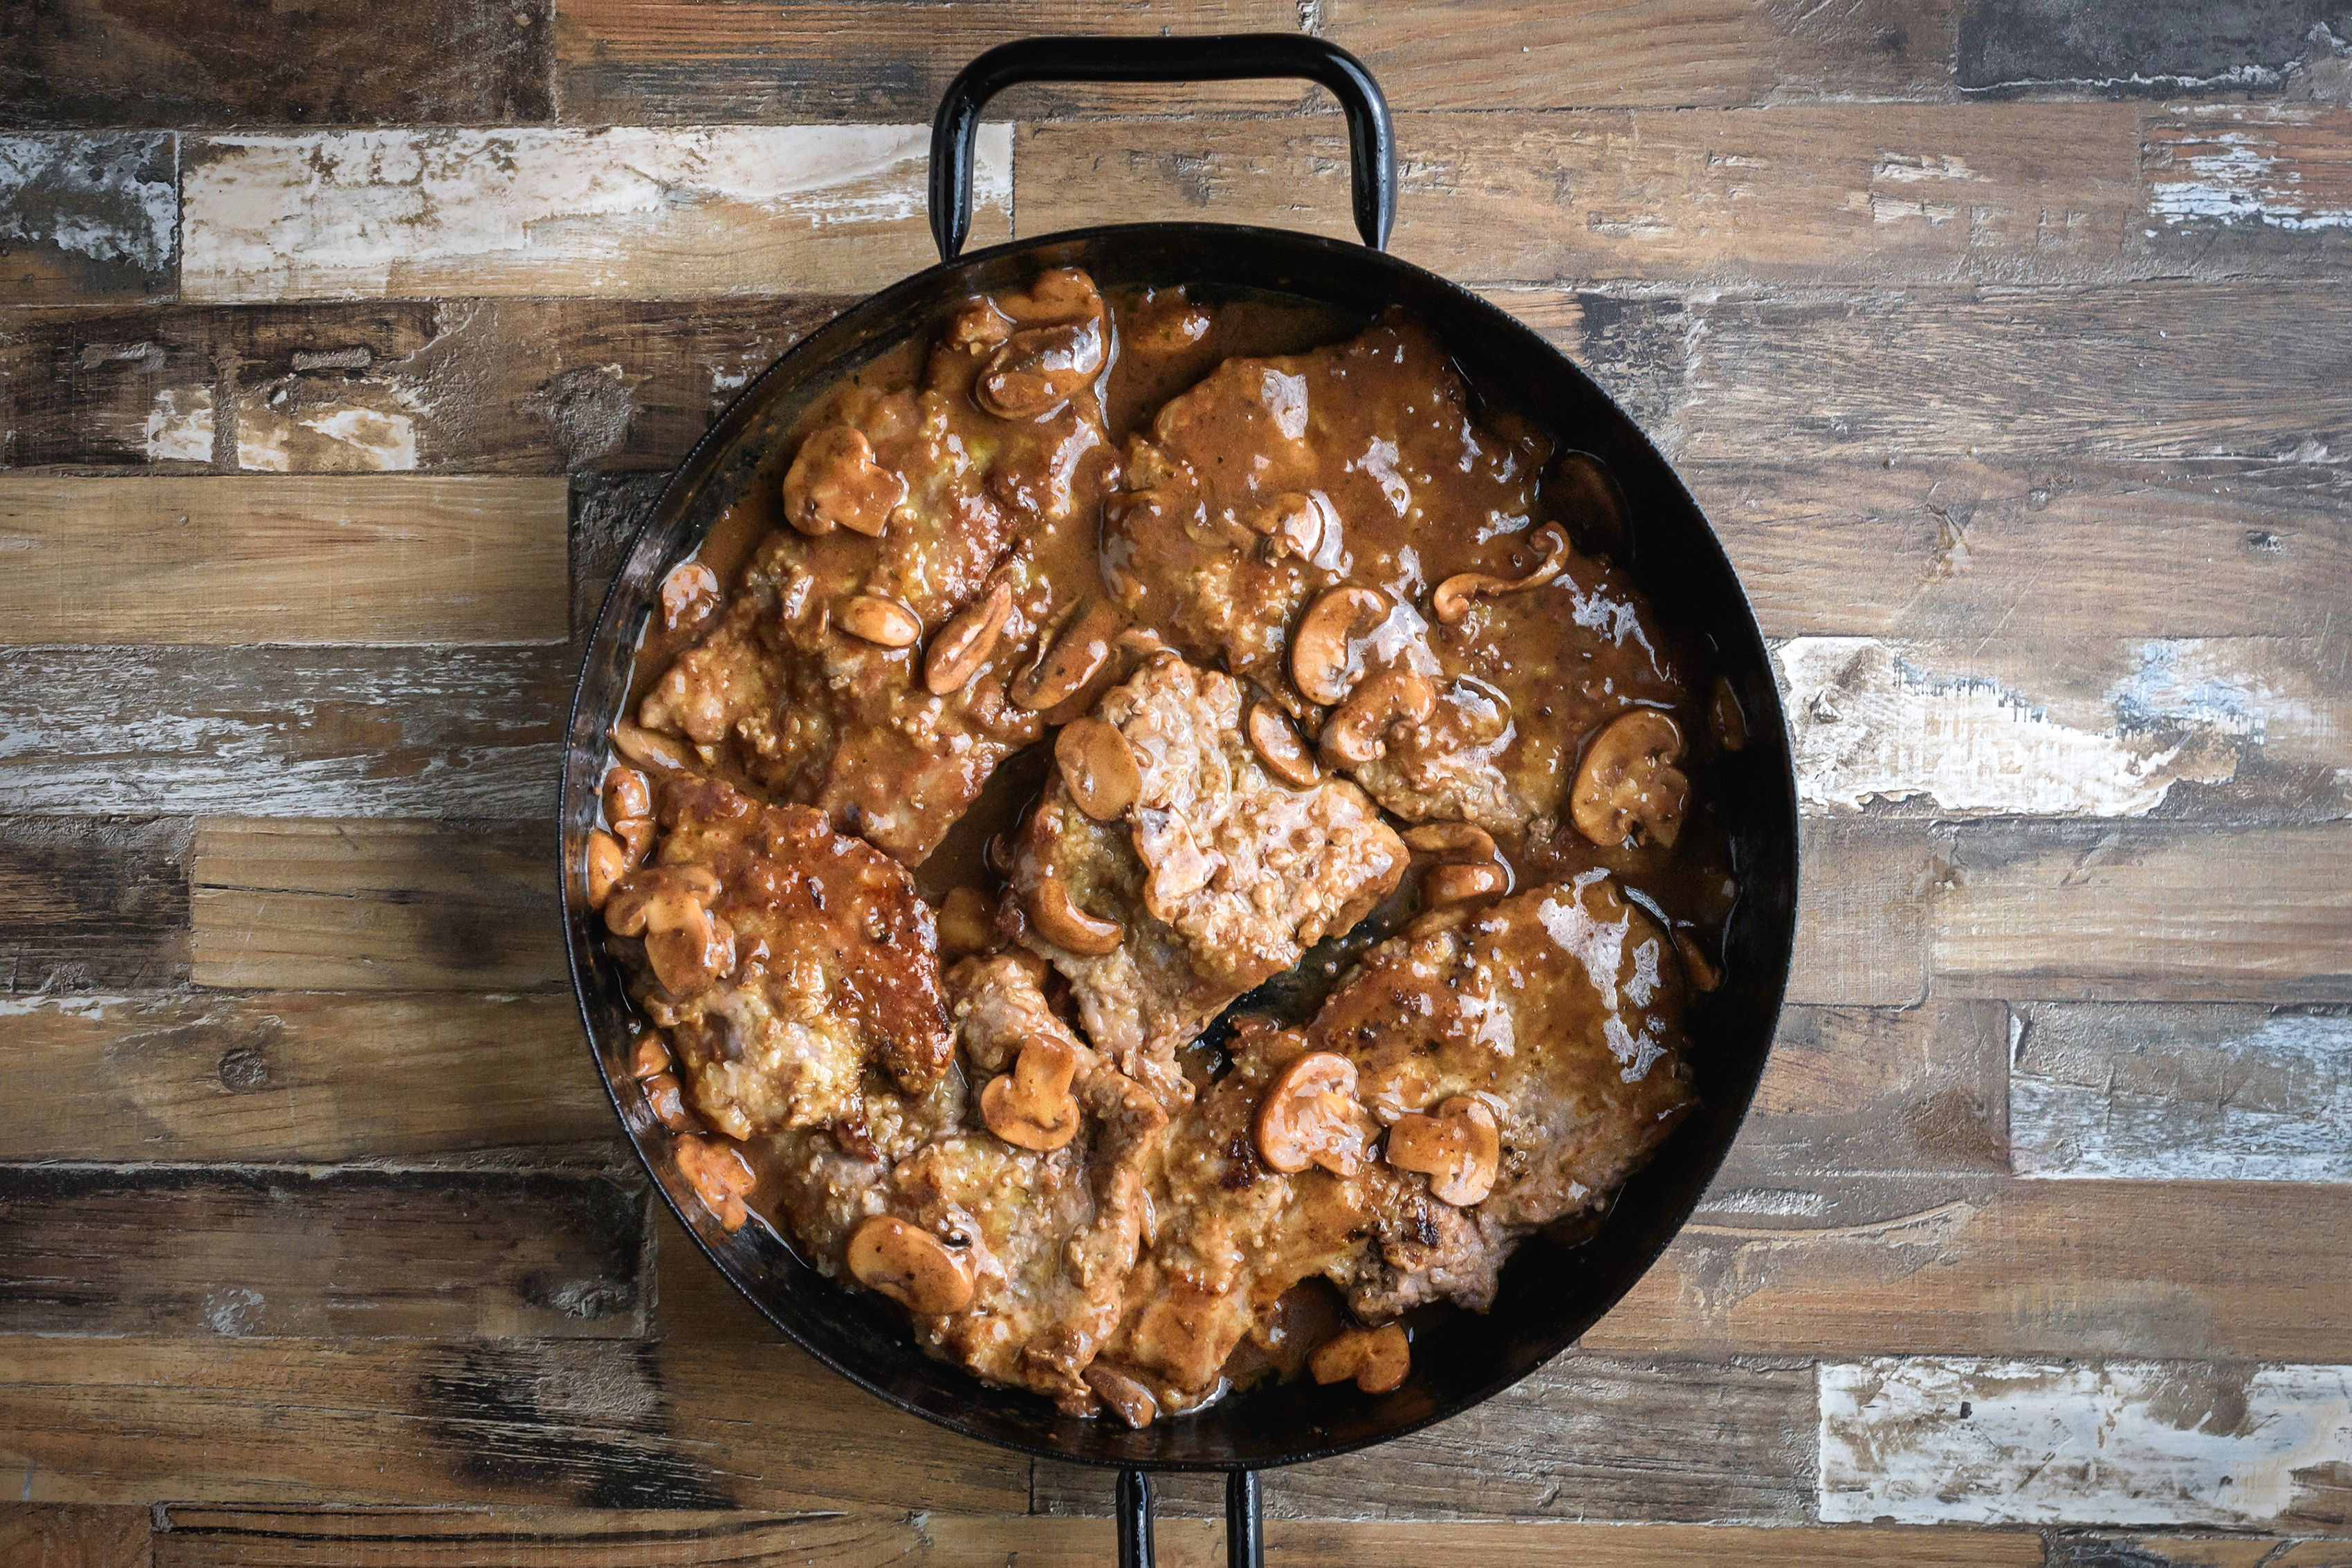 return veal to pan